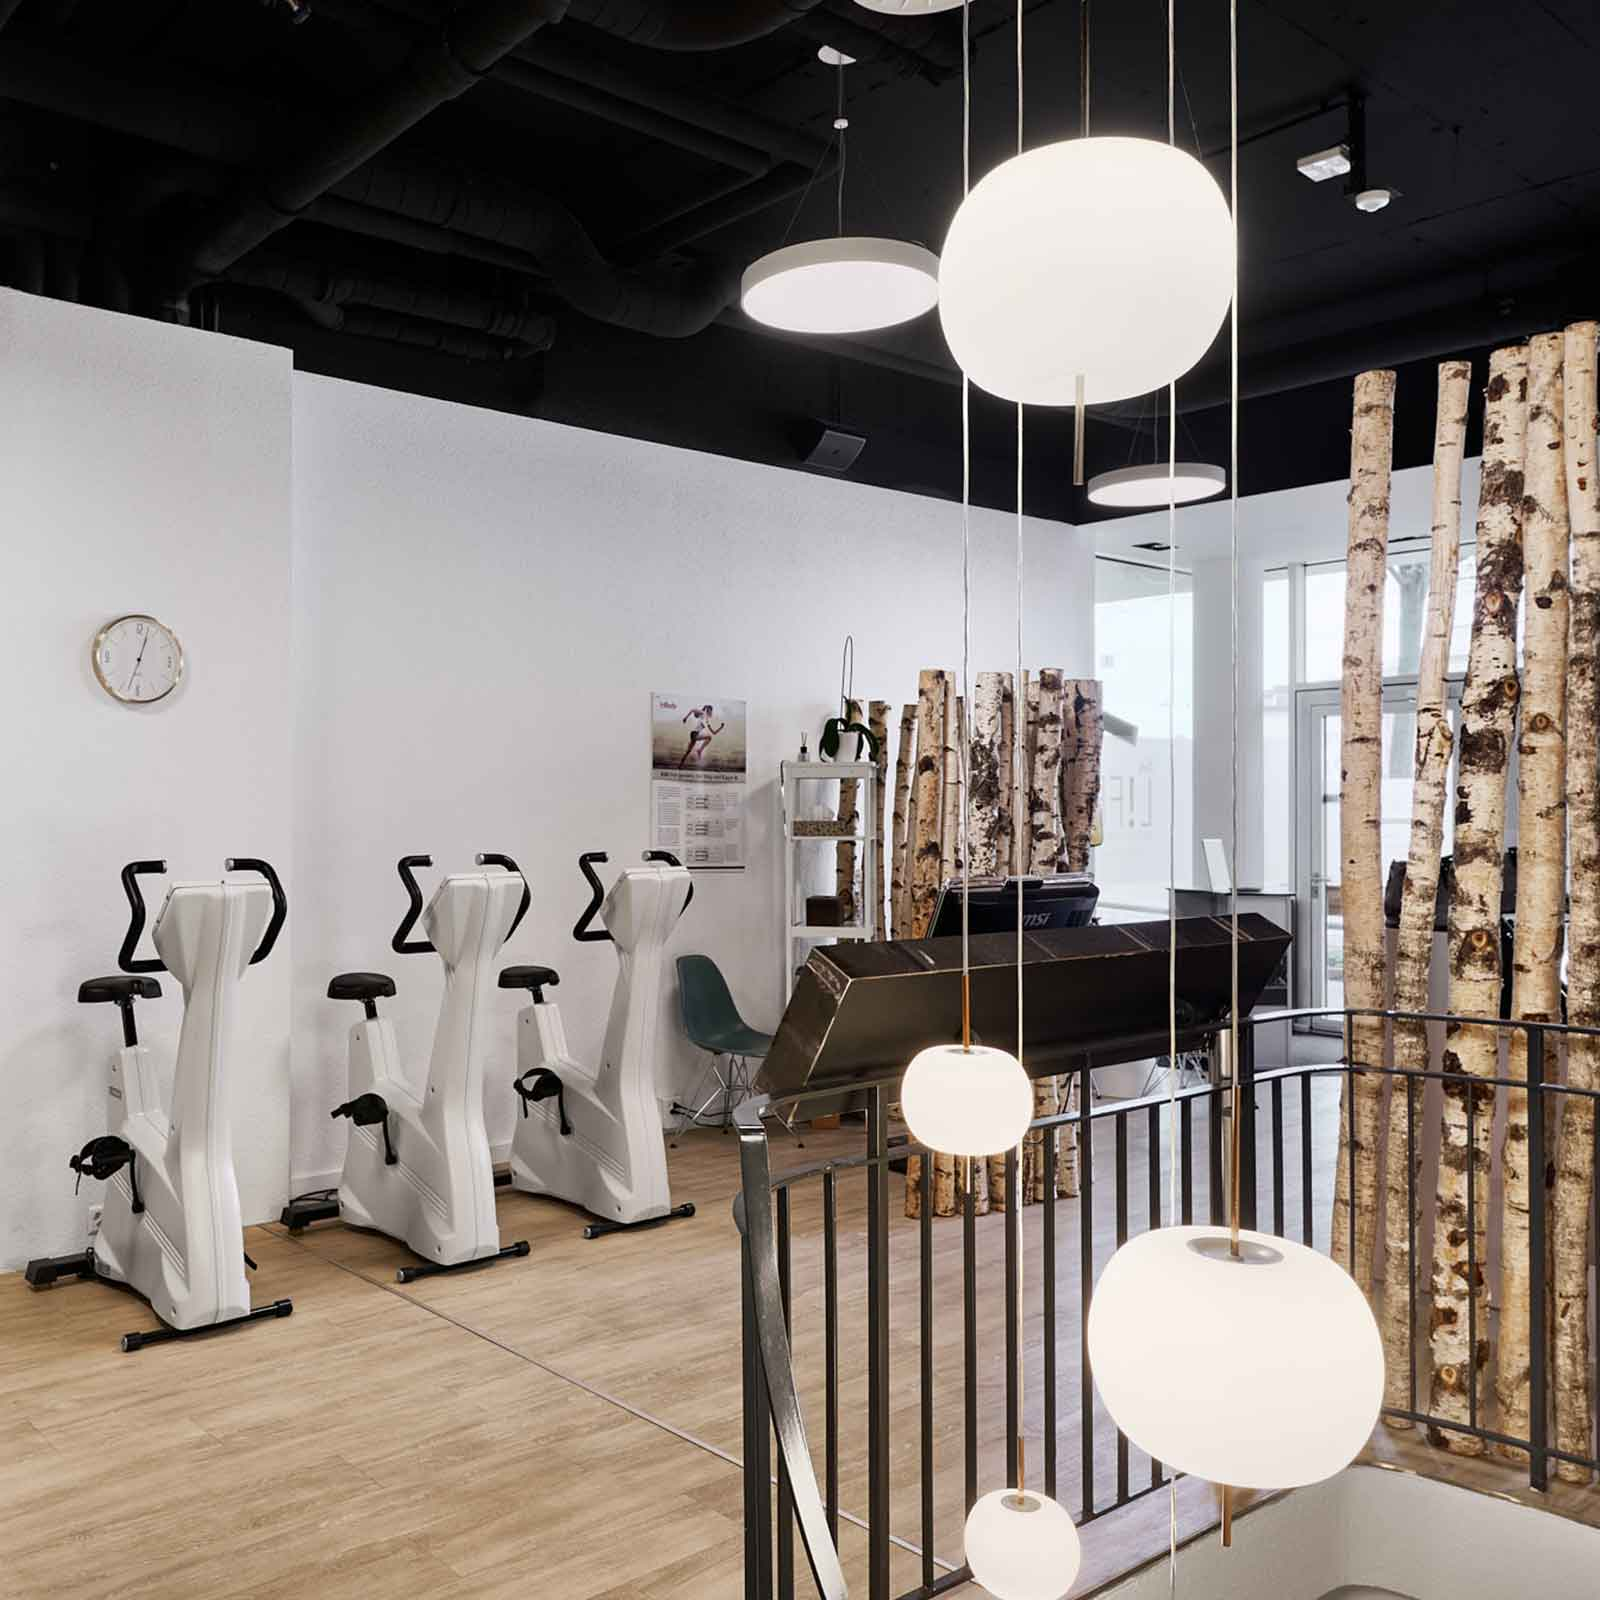 Lady Fitness Basel Fitnessgeräte